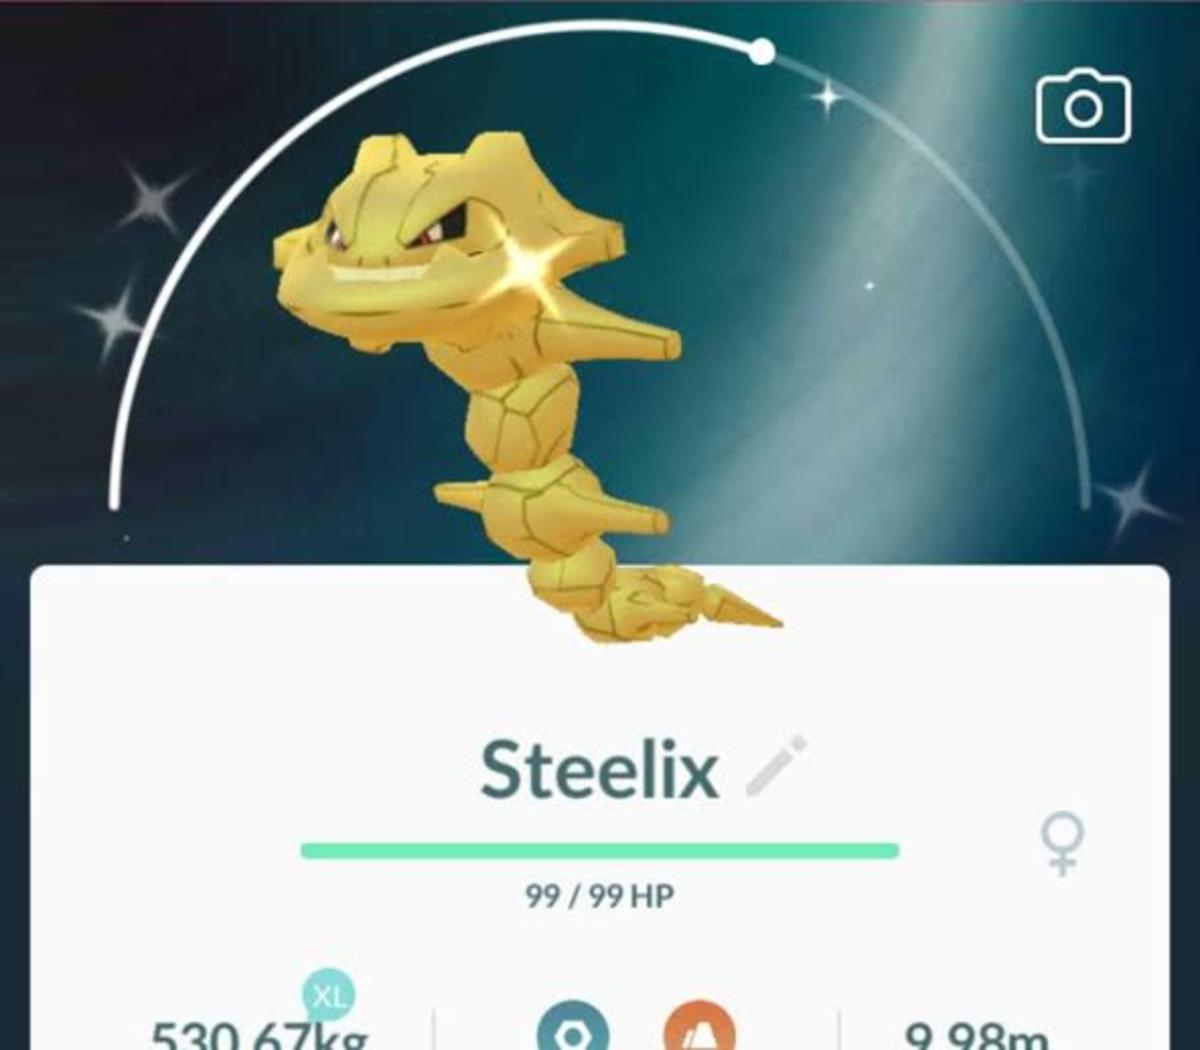 Shiny Steelix